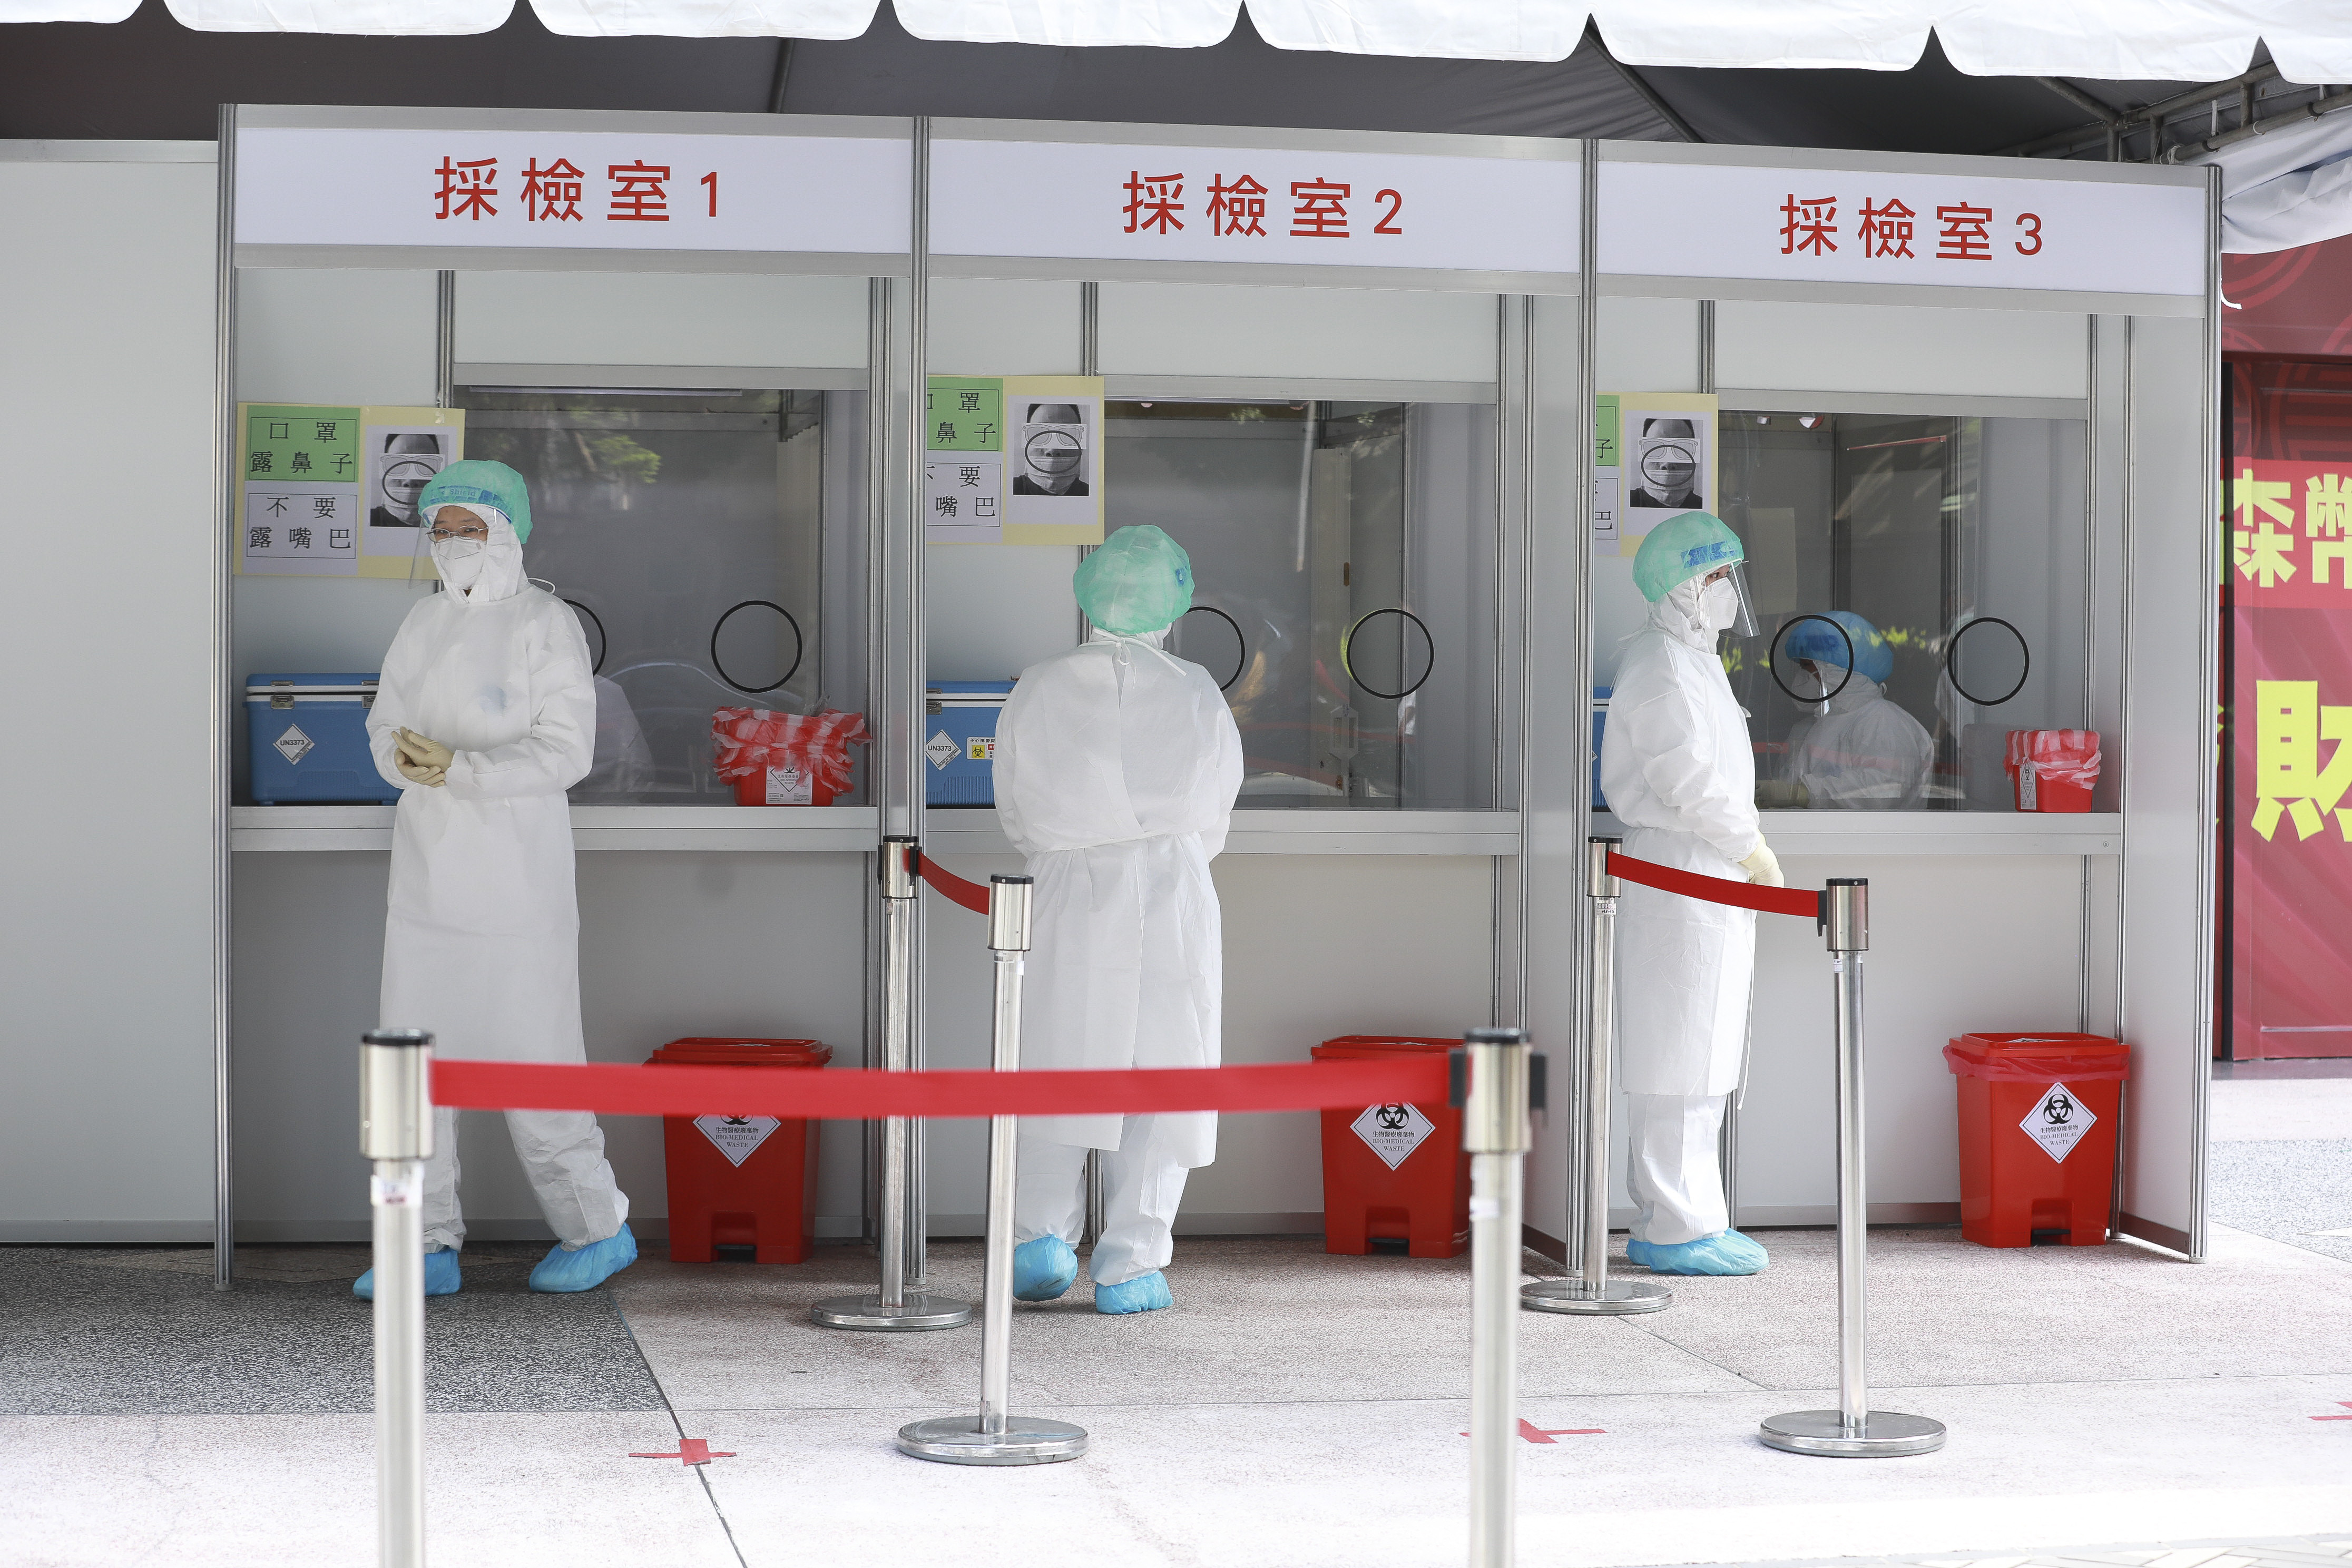 COVID-19,疫苗,蘇益仁,EUA,SARS,快篩,PCR,兵工廠,戰略,醫療體系,蔡英文,蘇貞昌,陳時中